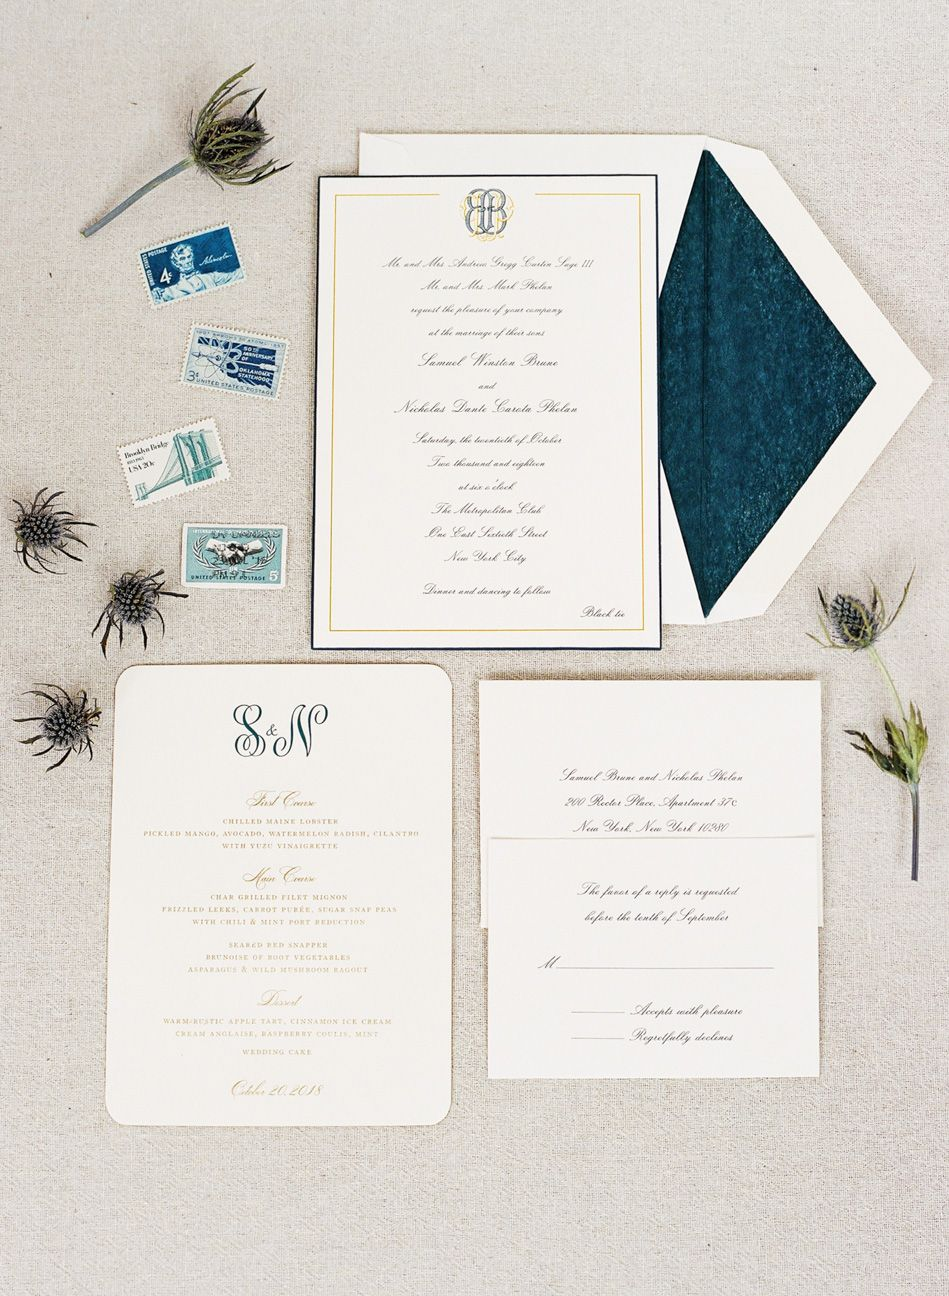 KarenHillPhotography-Brune-Wedding-0001.jpg